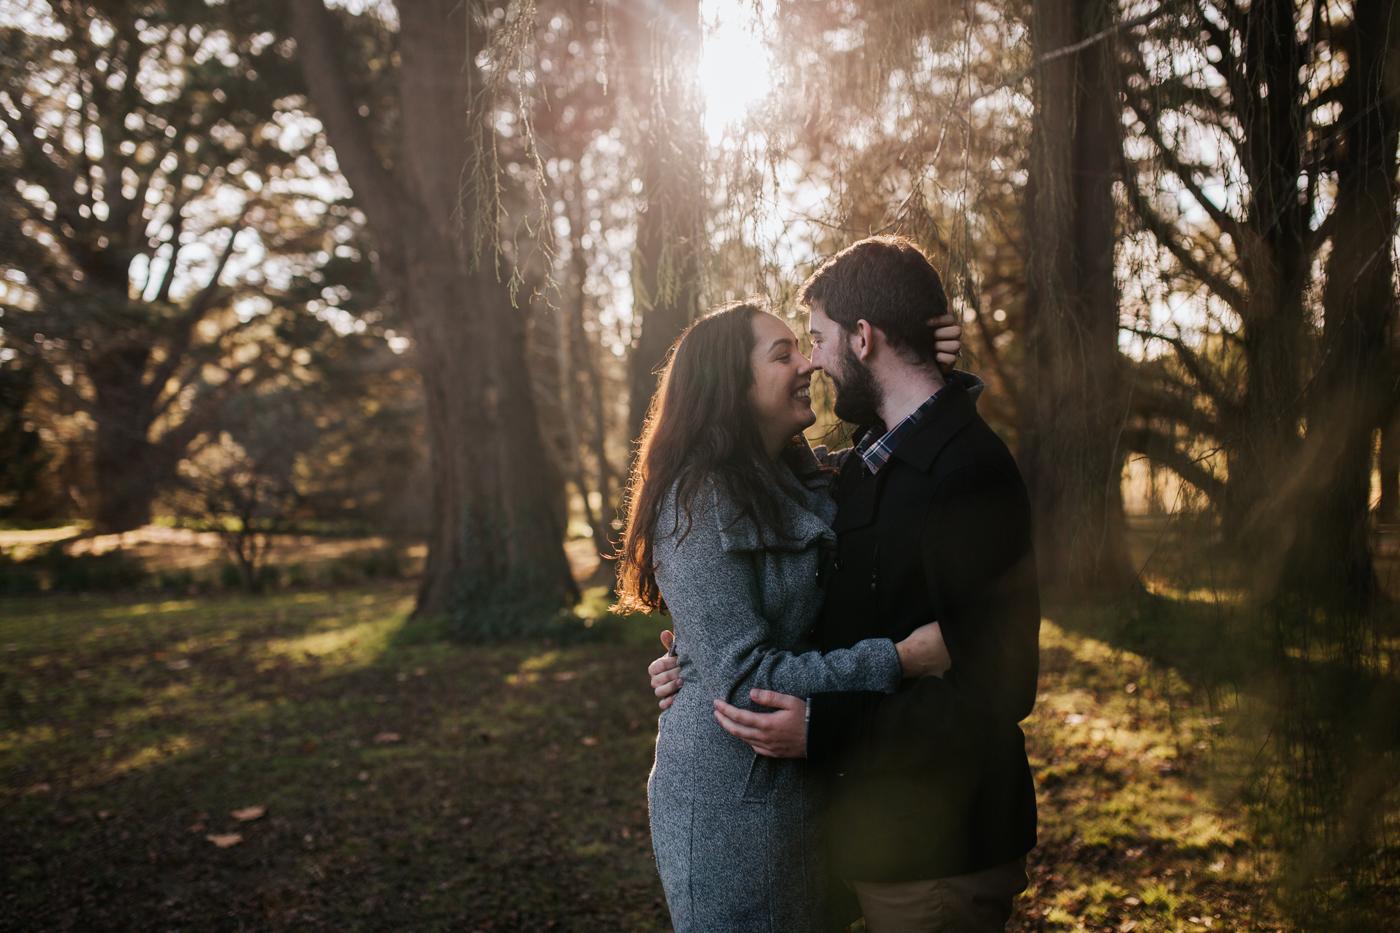 Kate & Kieran - Southern Highlands Engagement - Samantha Heather Photography-2.jpg